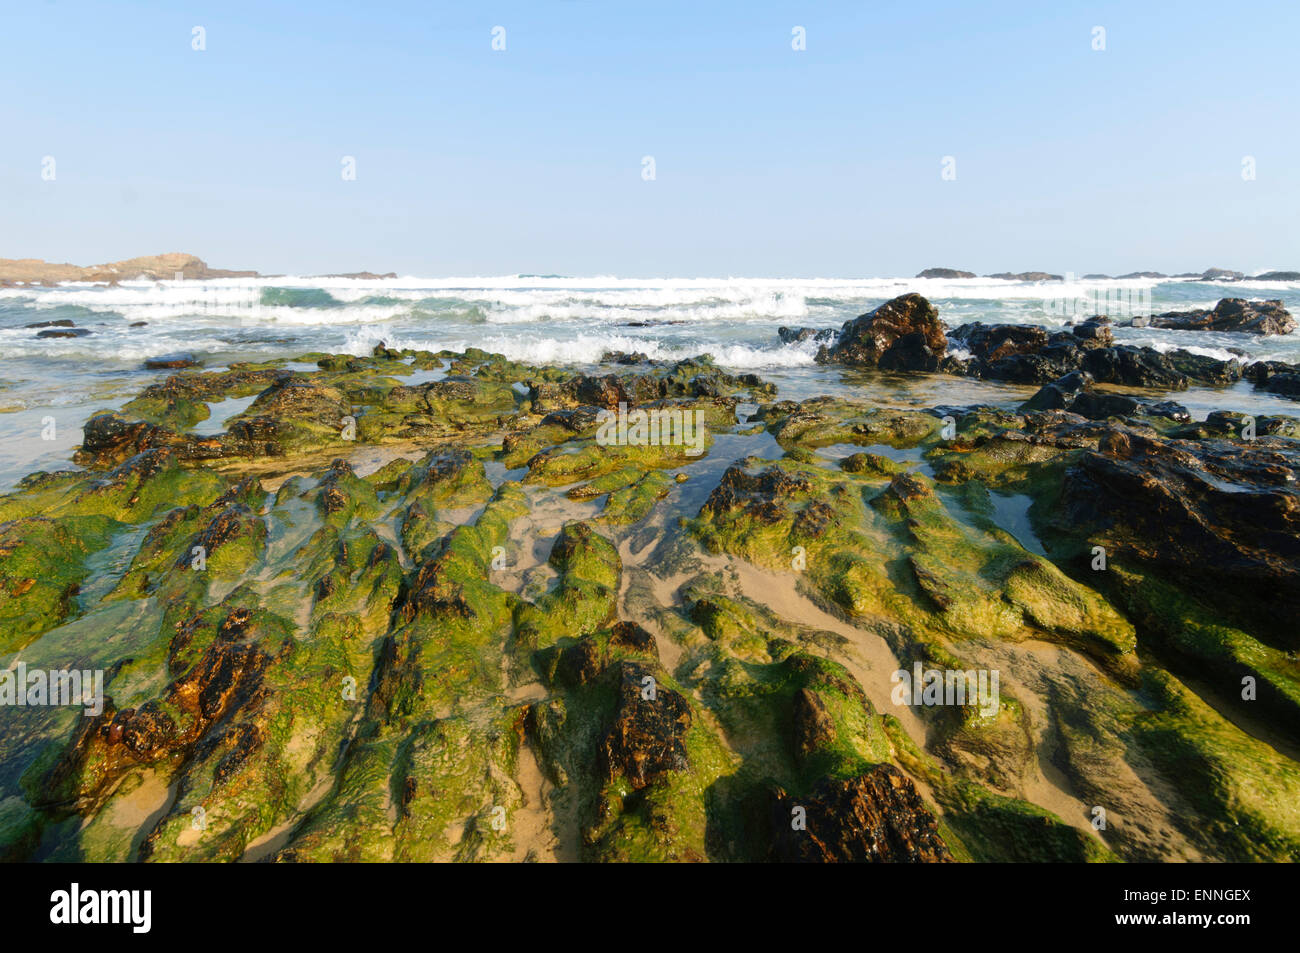 Mystery Bay, Eurobodalla National Park, New South Wales, Australia - Stock Image